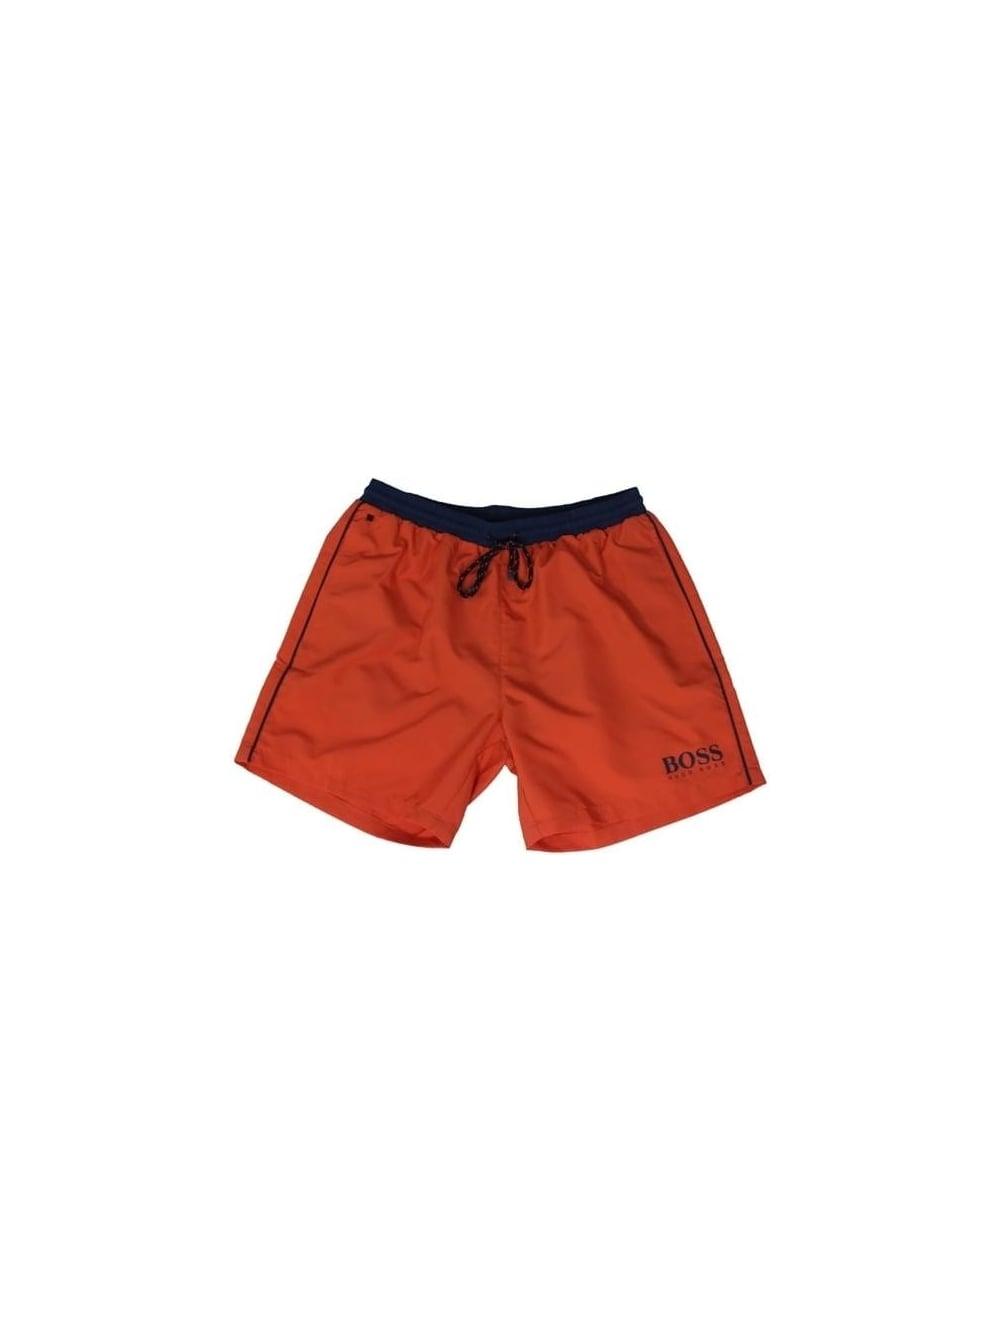 5b7670ec1 Hugo Boss Black Starfish Swim Shorts in Open Orange - Northern Threads